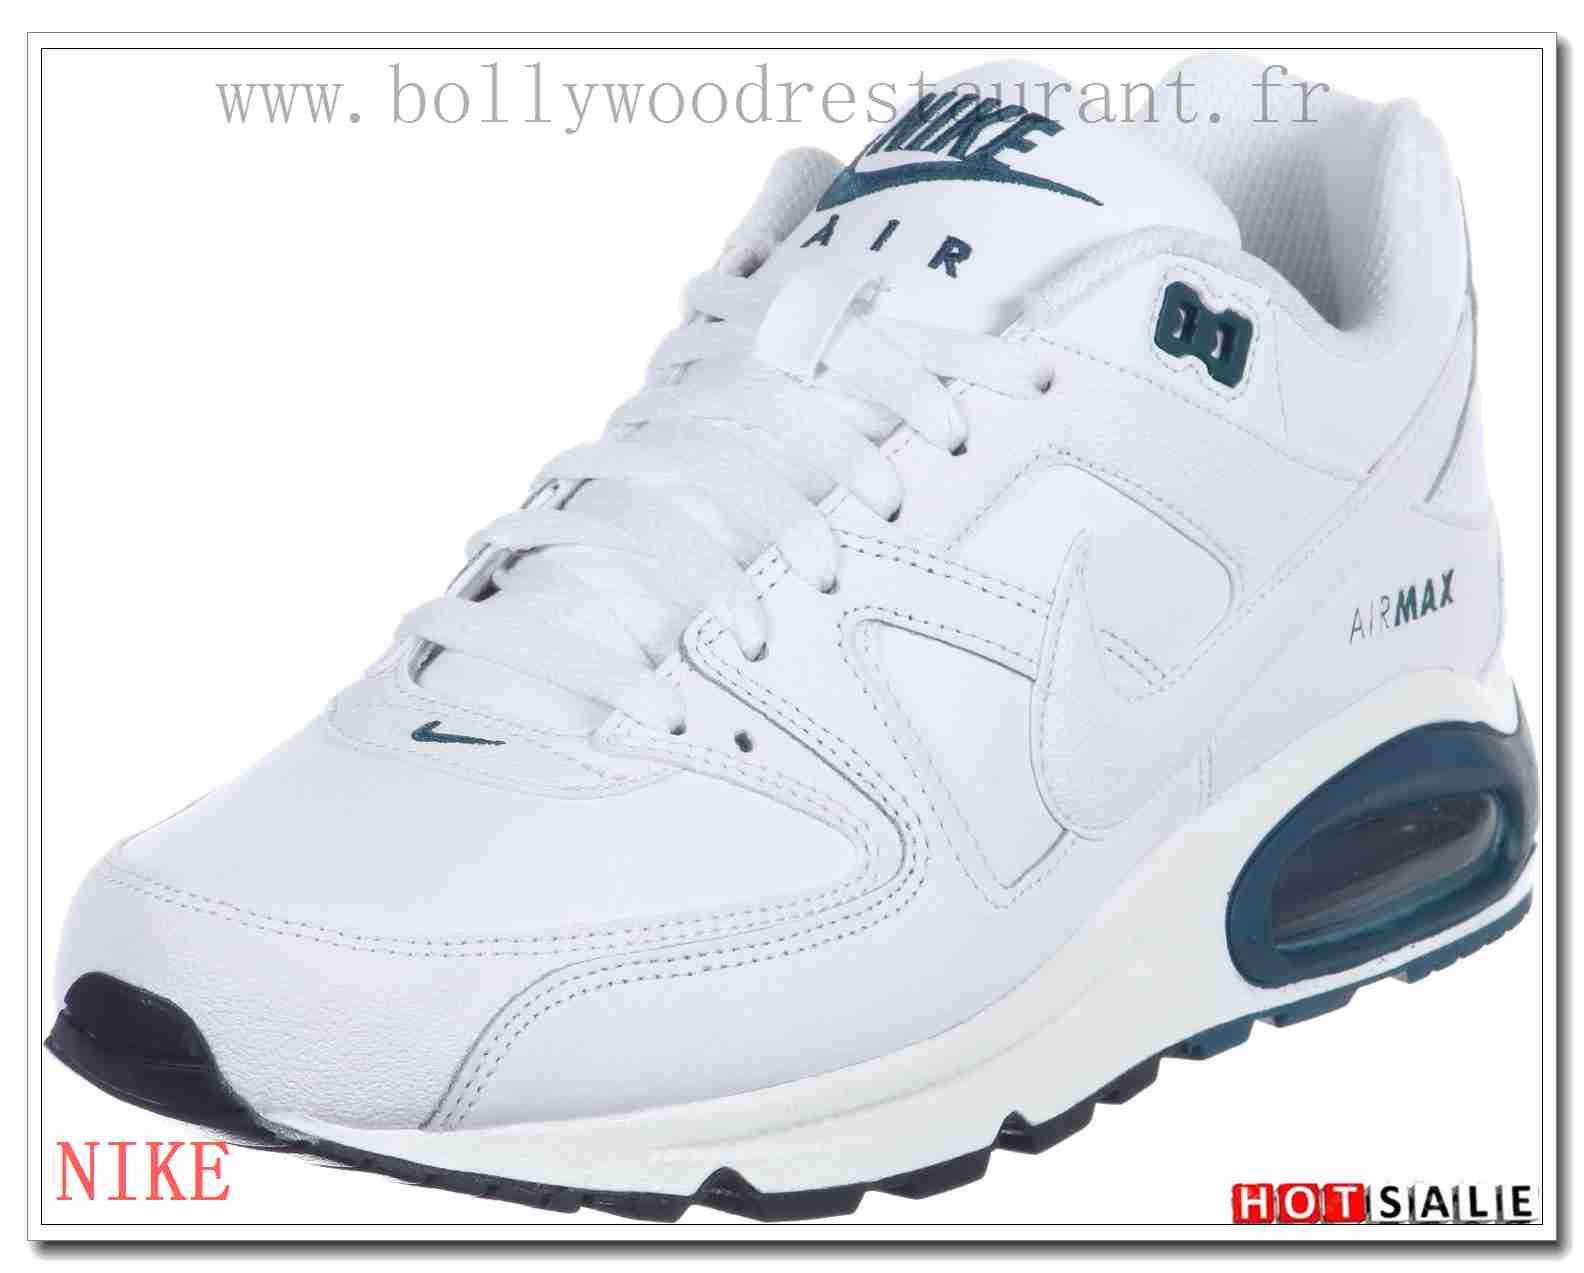 new product e29f3 7bd57 RD5520 Traitement antimicrobien 2018 Nouveau style Nike Air Max Command - Femme  Chaussures - Promotions Vente